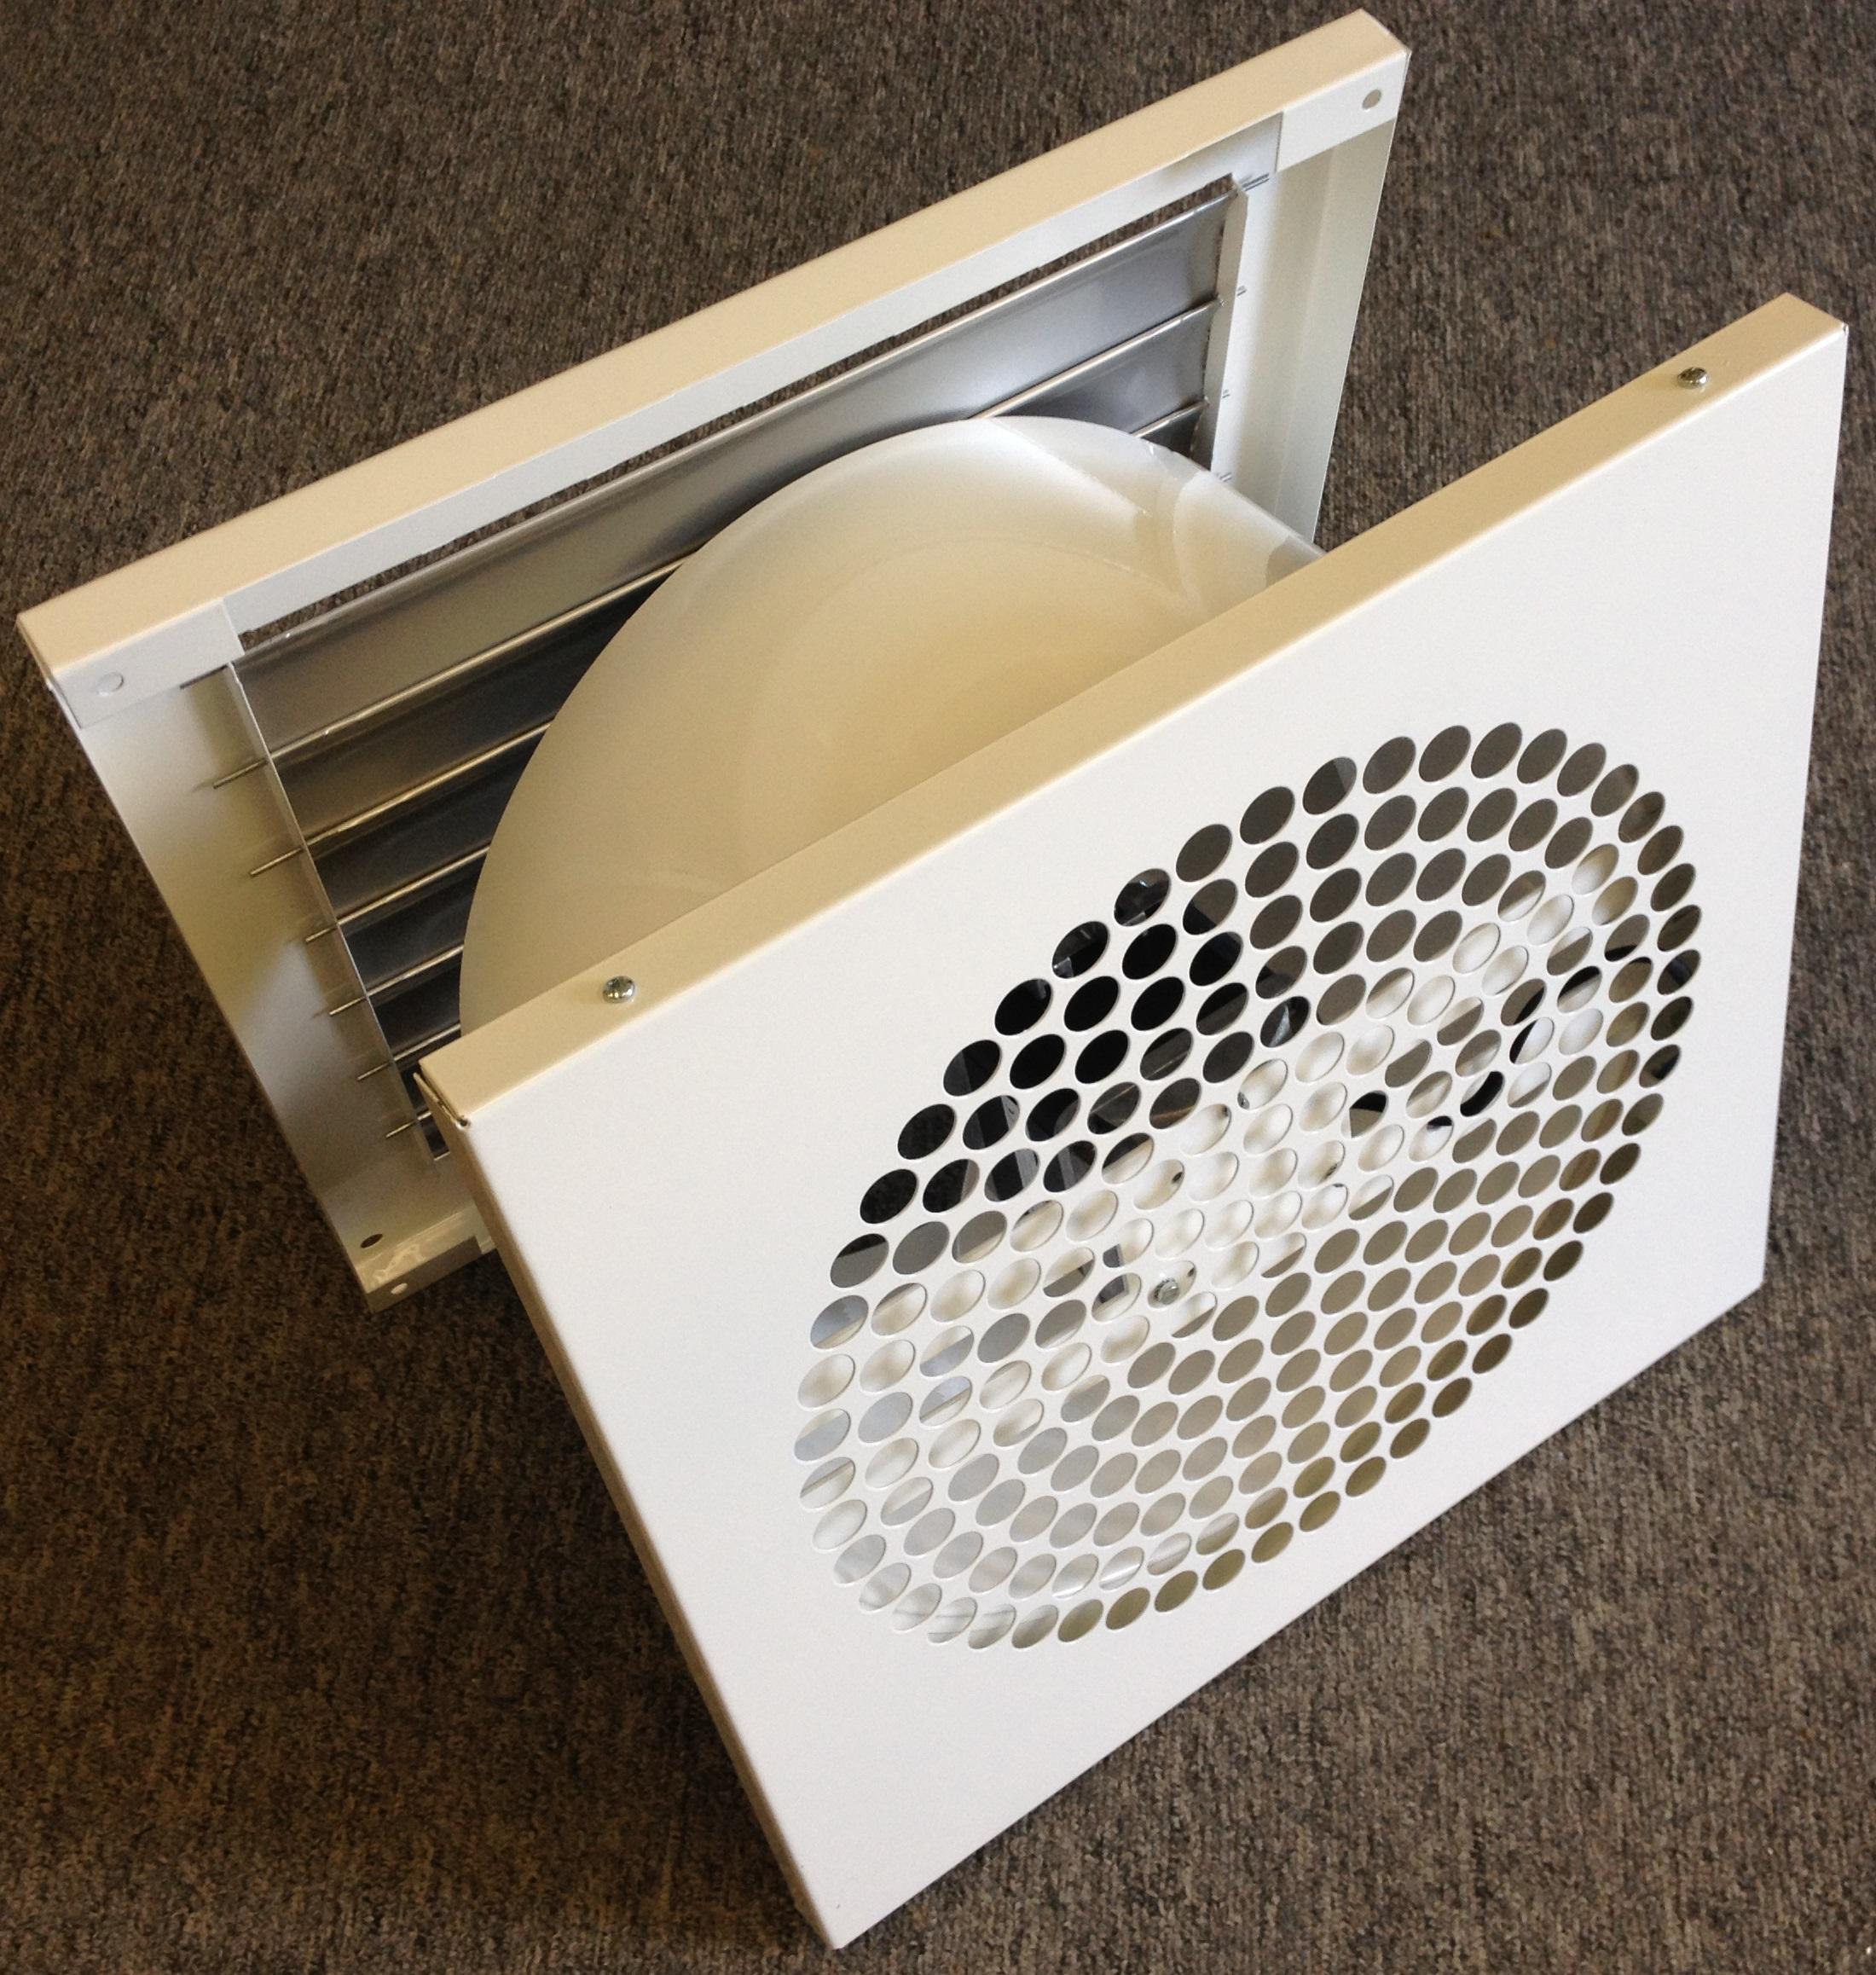 nv-200-ventilator-500-m3-hod